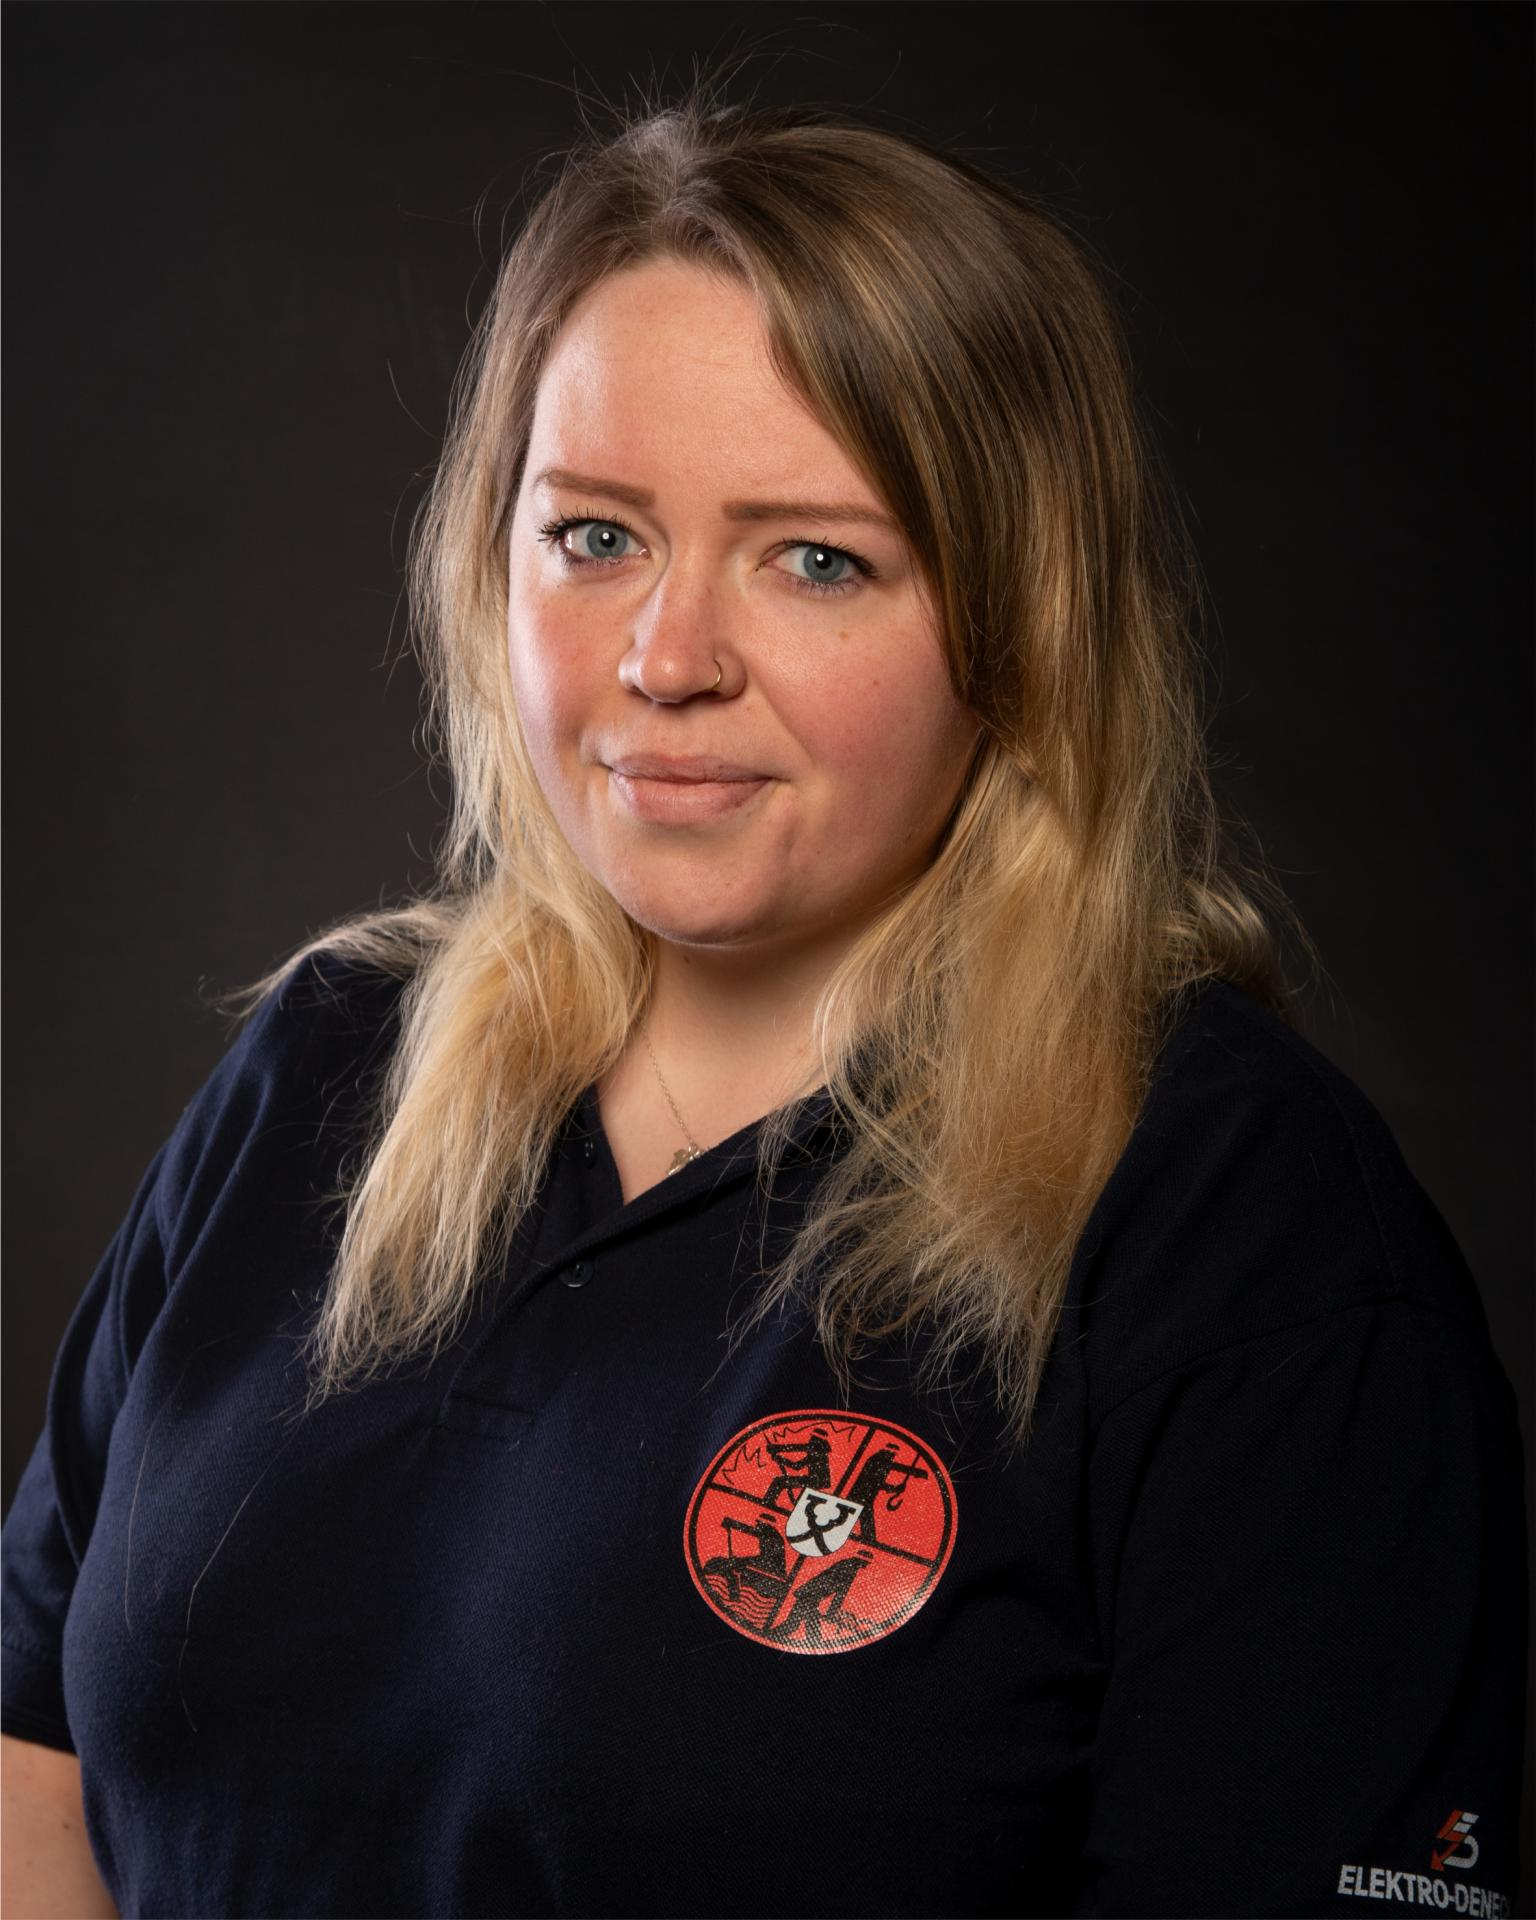 Laura Krüger